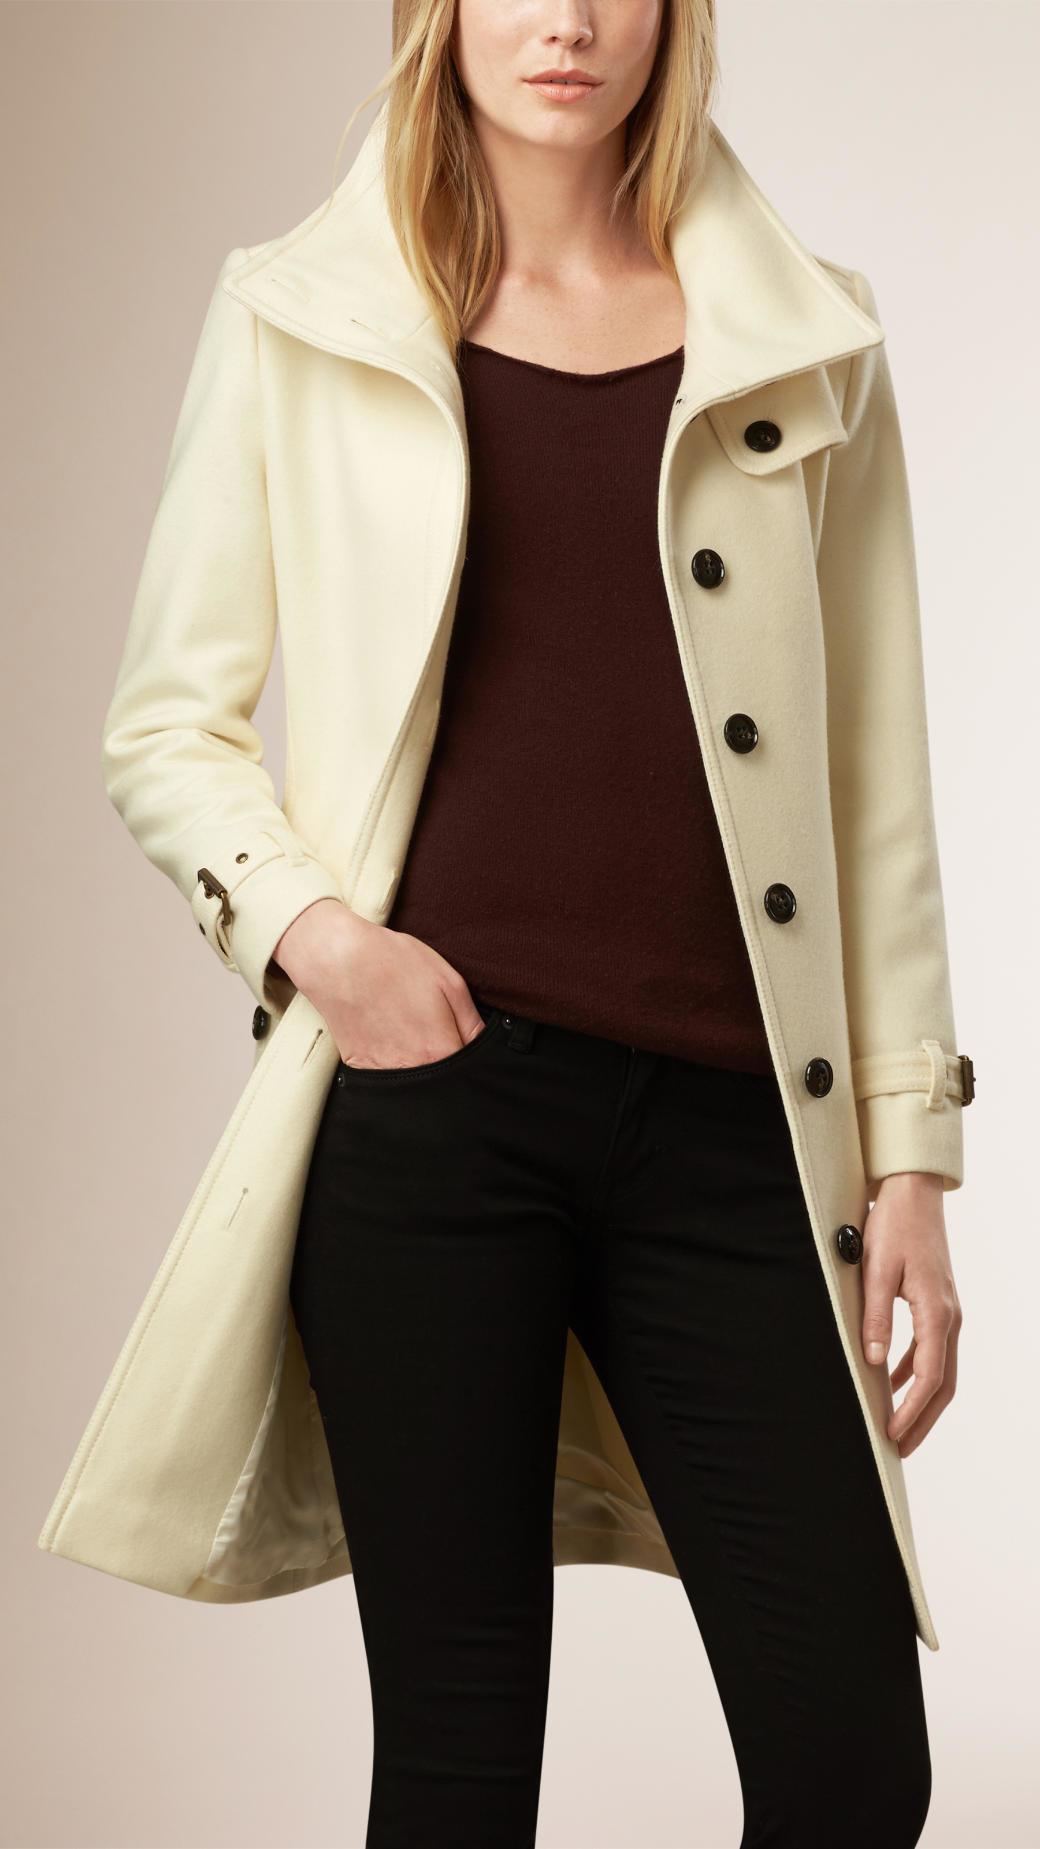 cdad3e37cec9 Burberry Virgin Wool Cashmere Blend Coat in Natural - Lyst